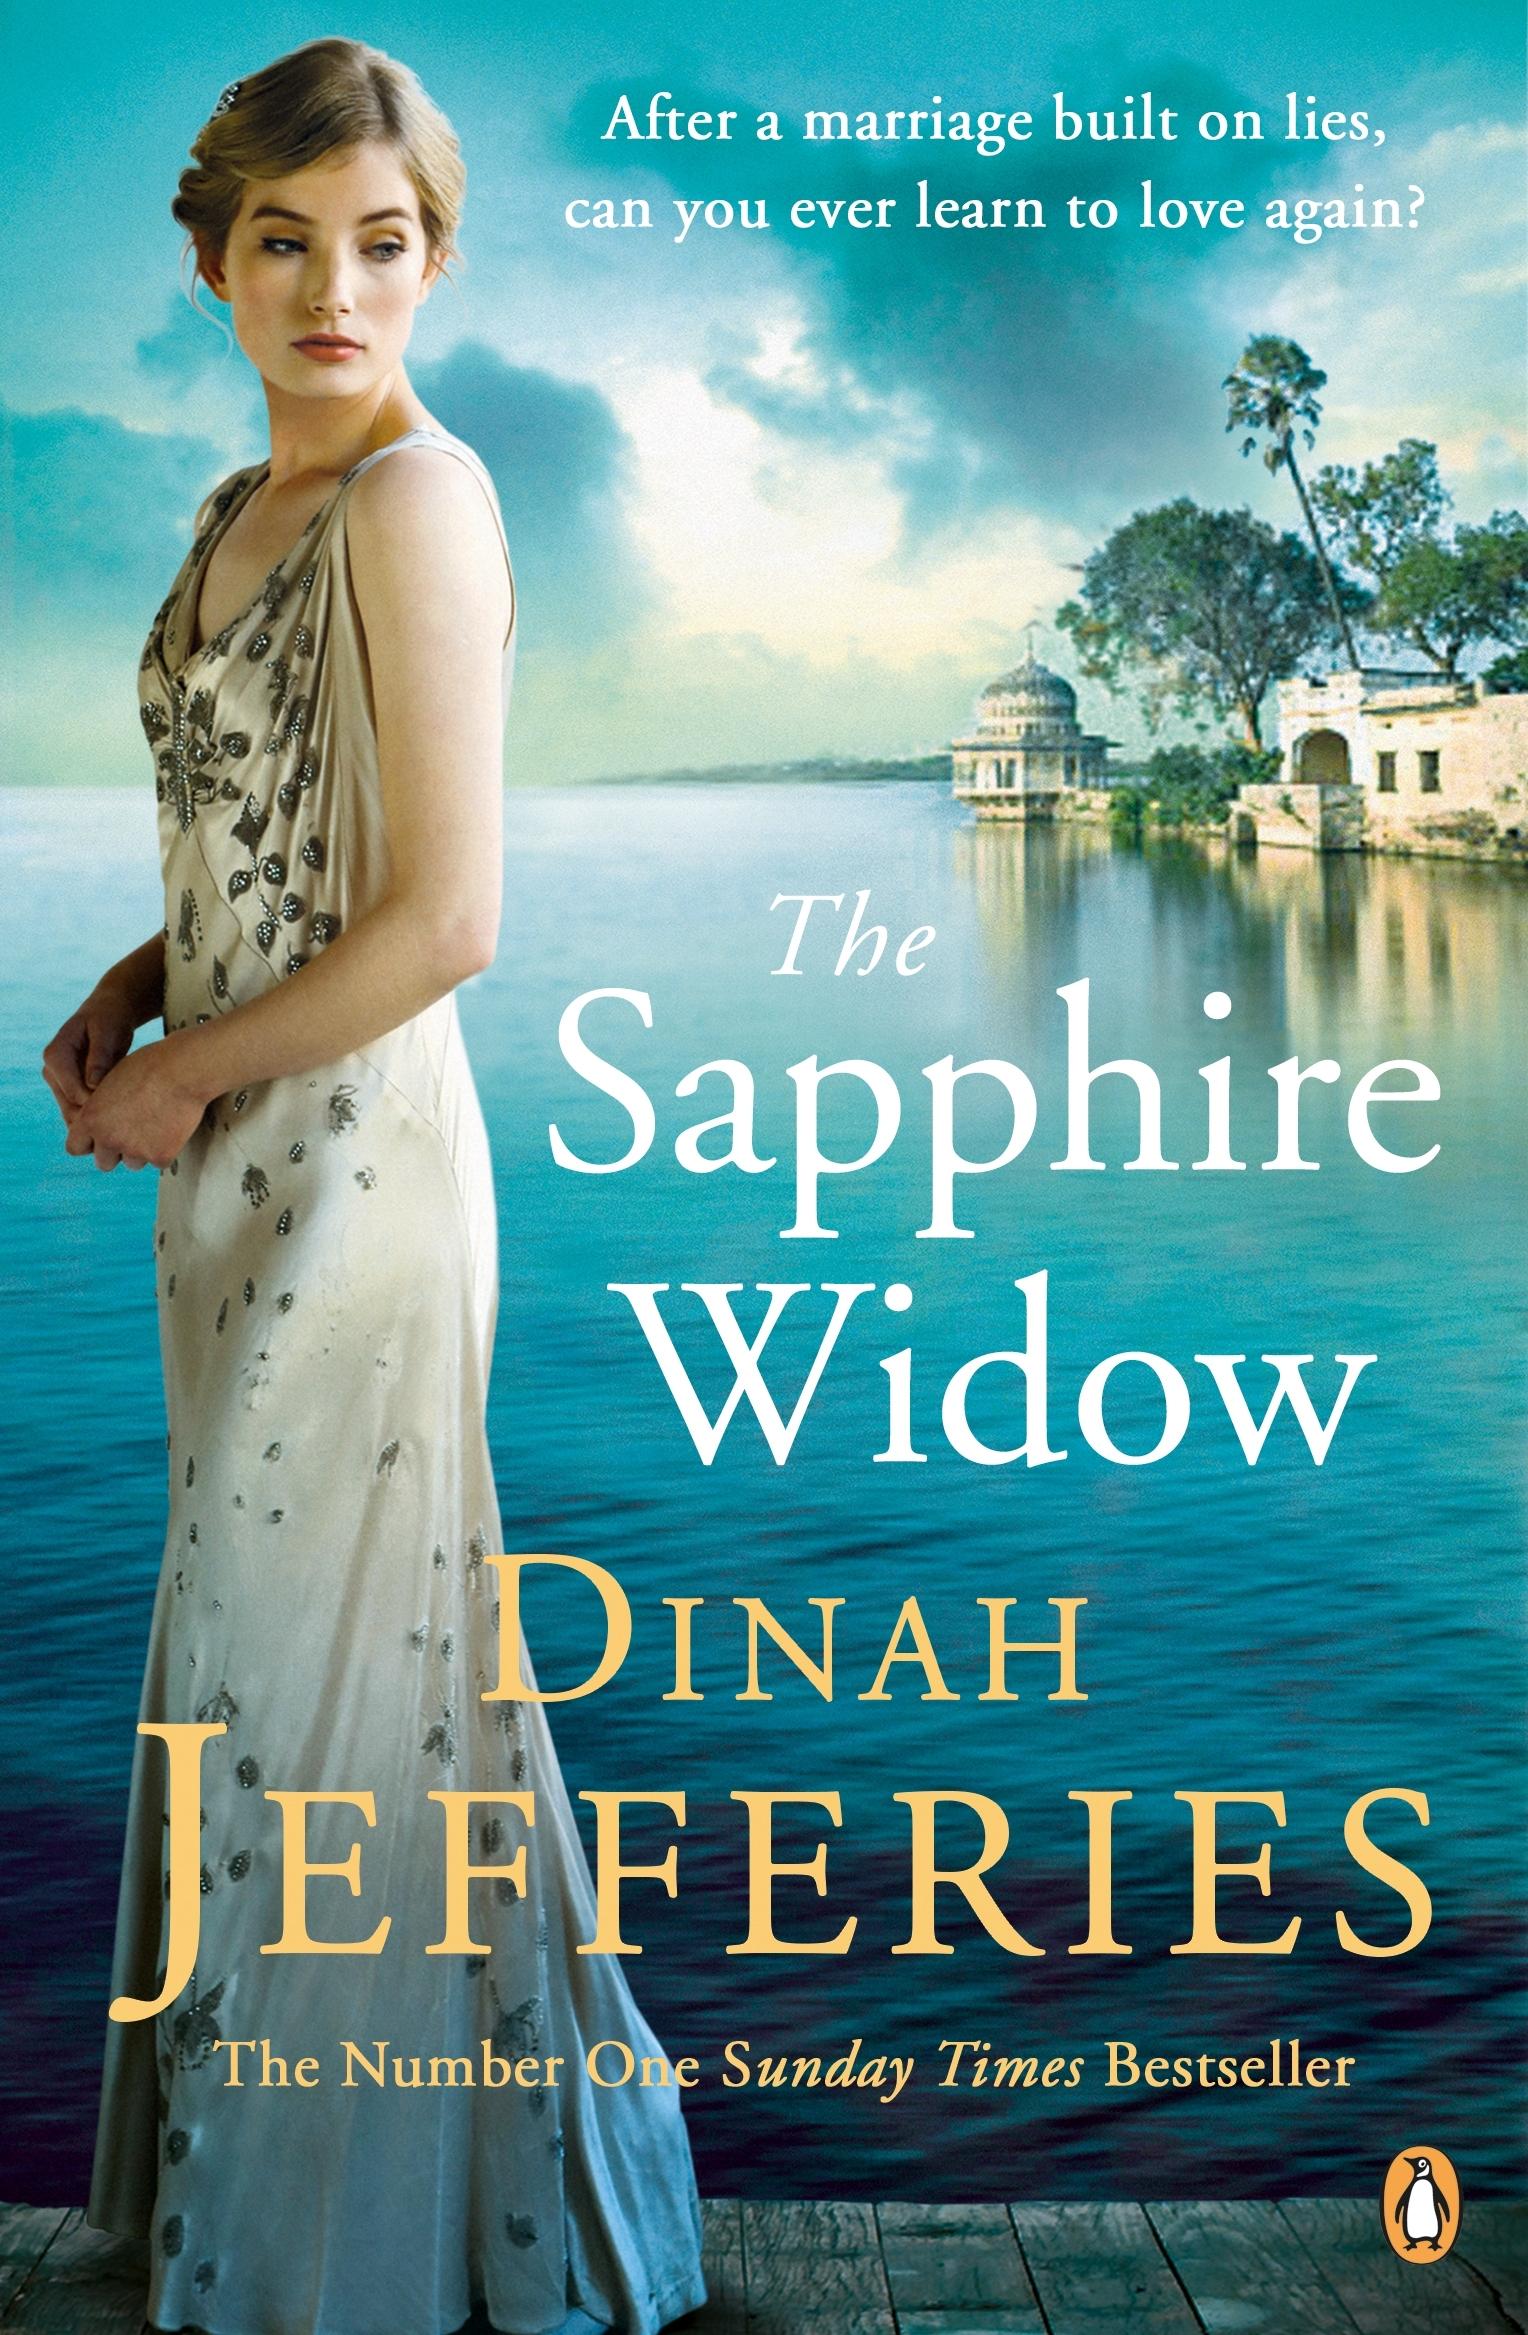 The Sapphire Widow